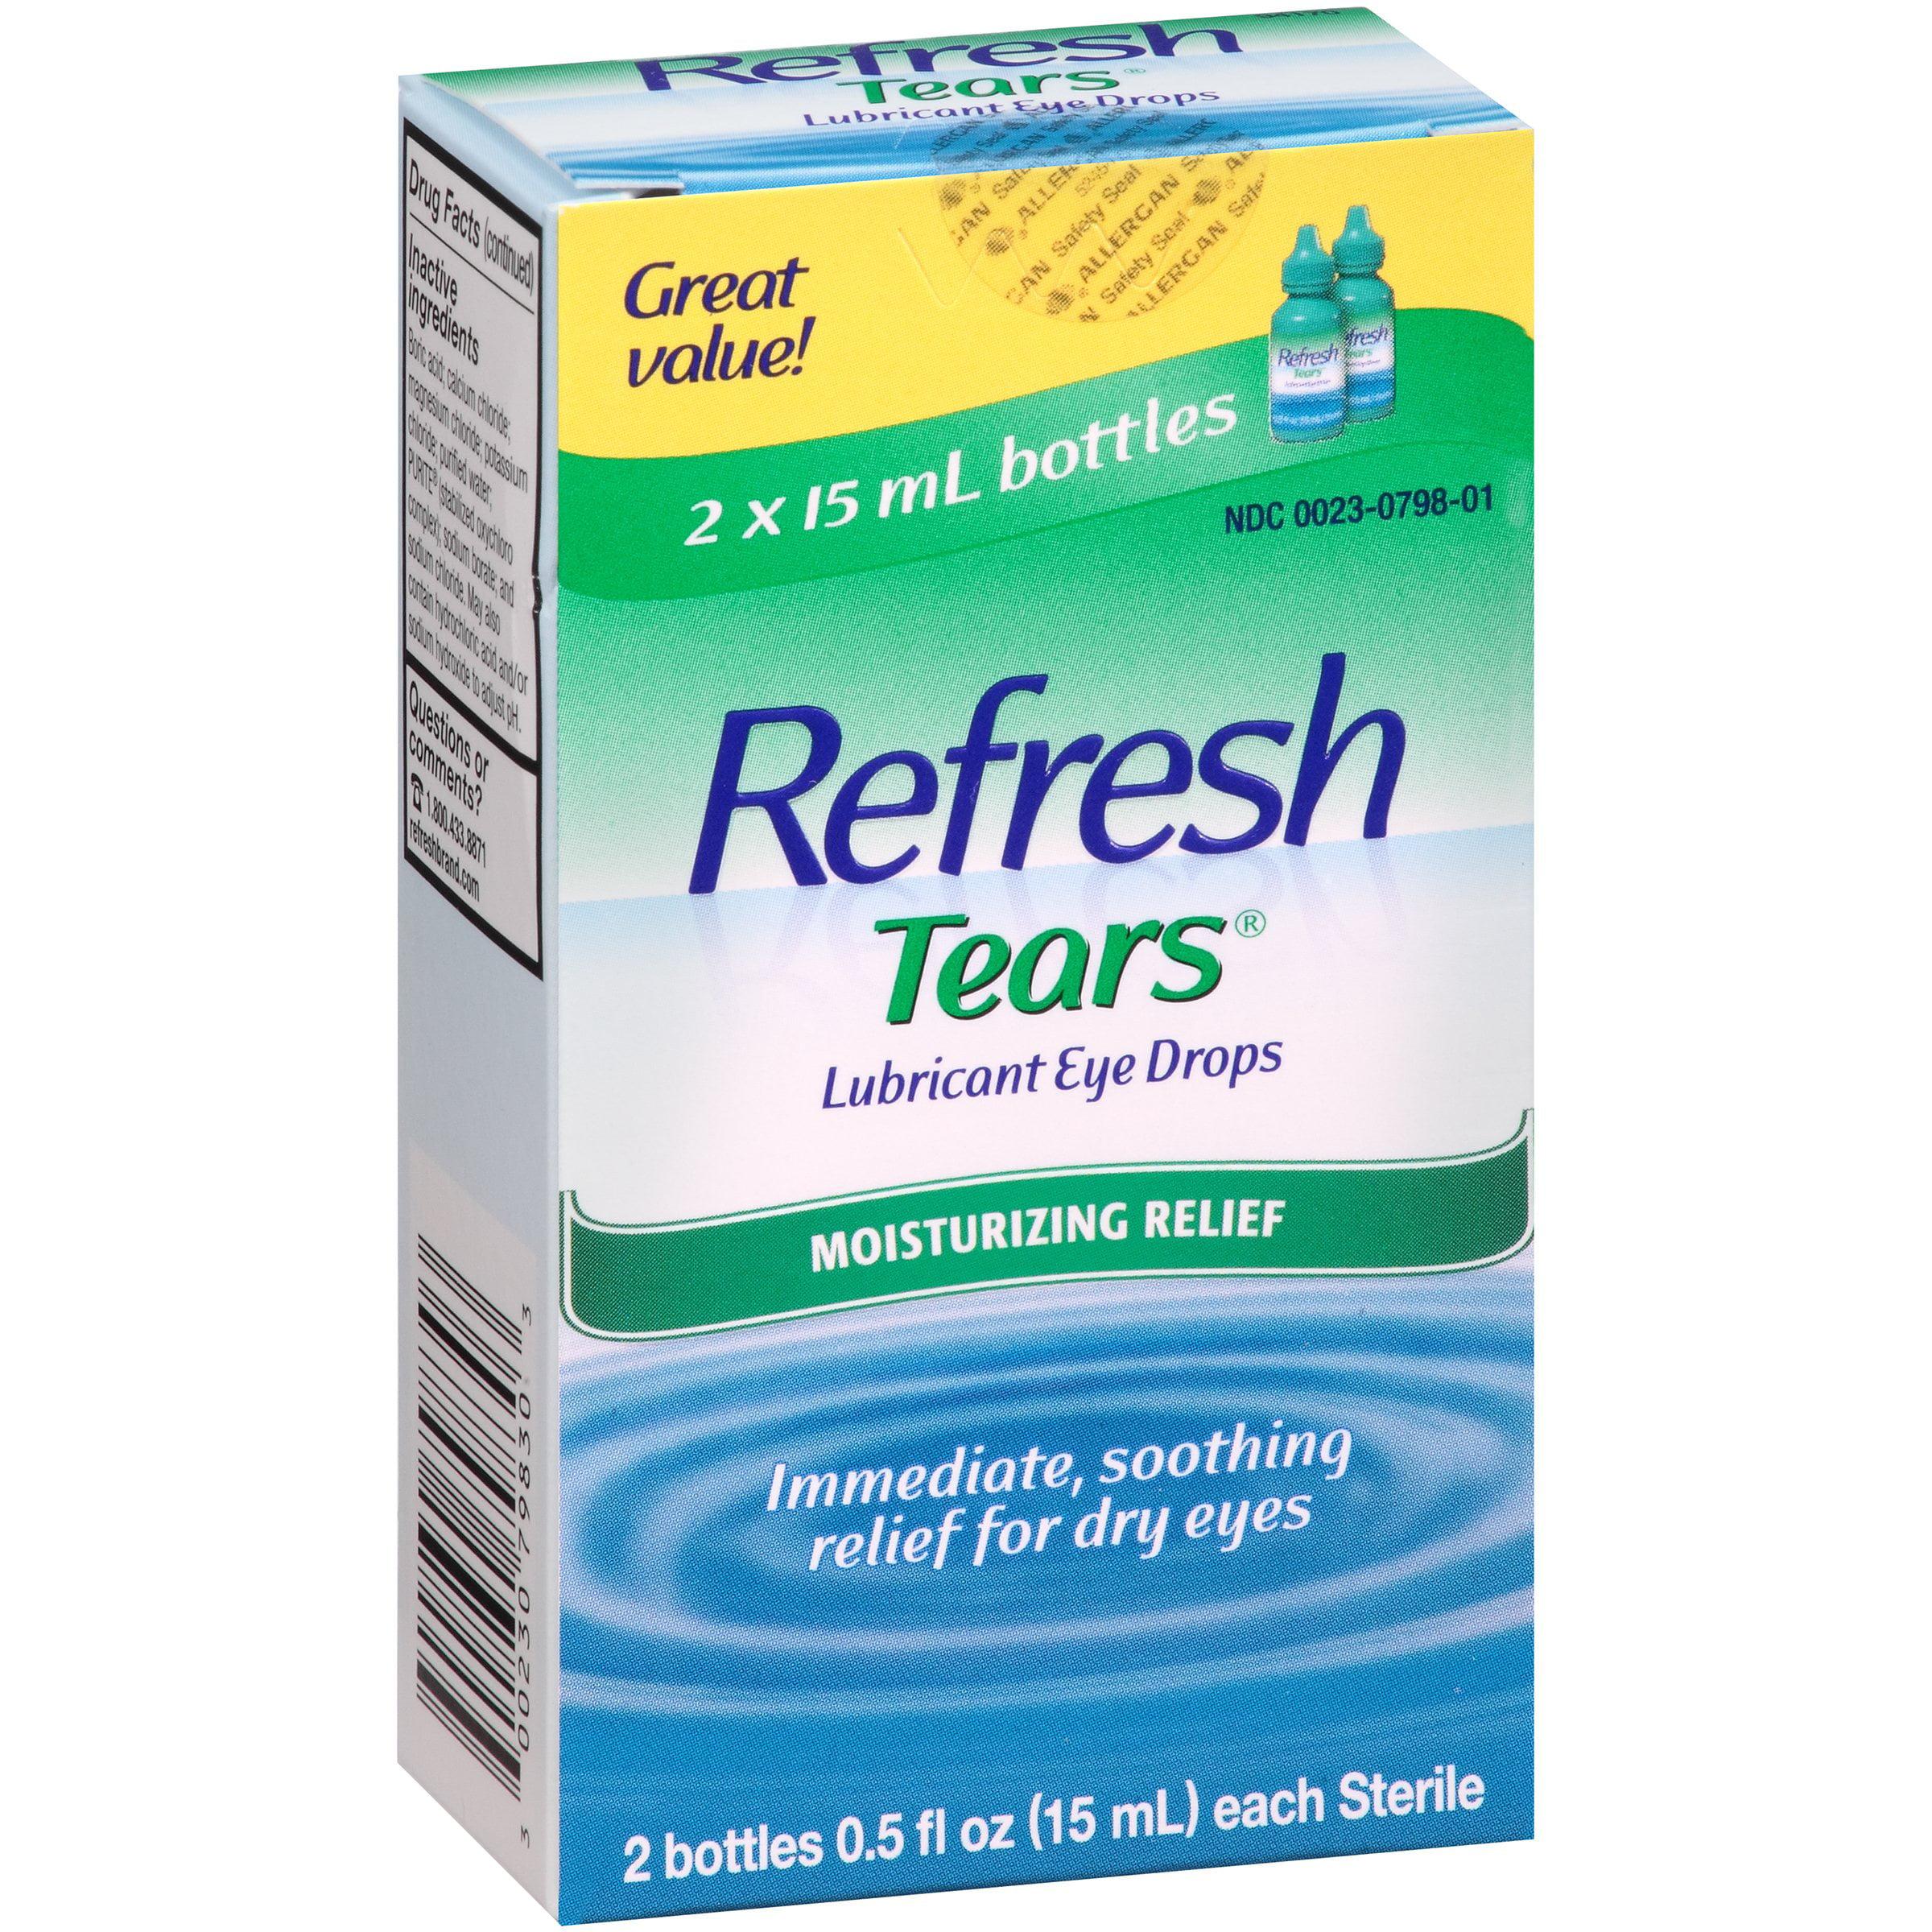 Refresh Lubricant Eye Drops Value Size Refresh Tears, 2 - .5 Oz bottles, 1 Oz.